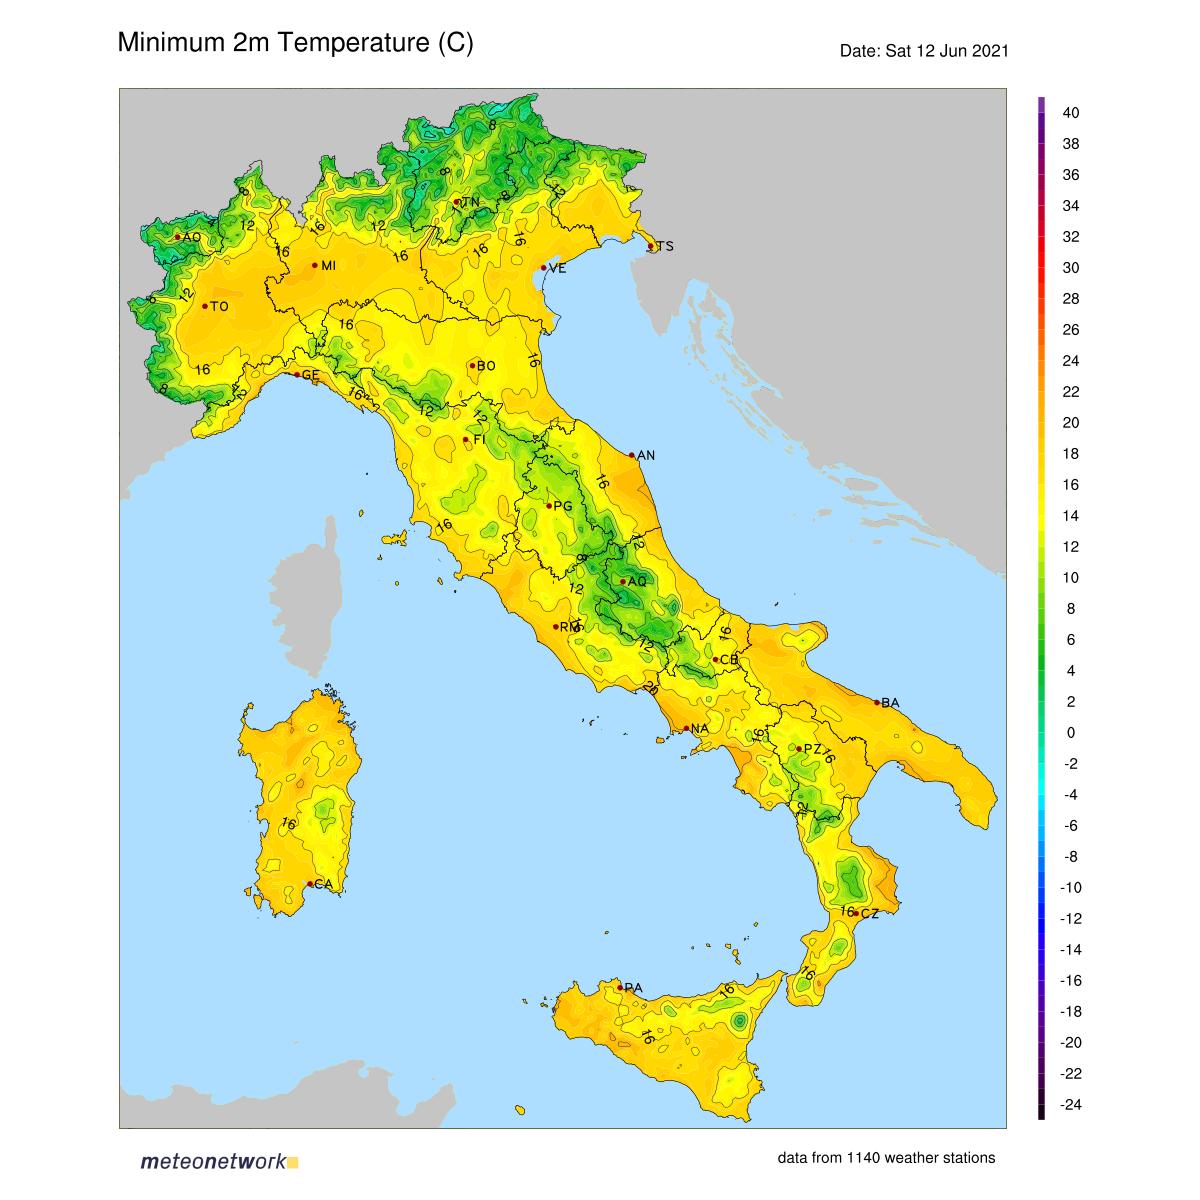 Dati Meteo 2021-06-12 temp_min_italia